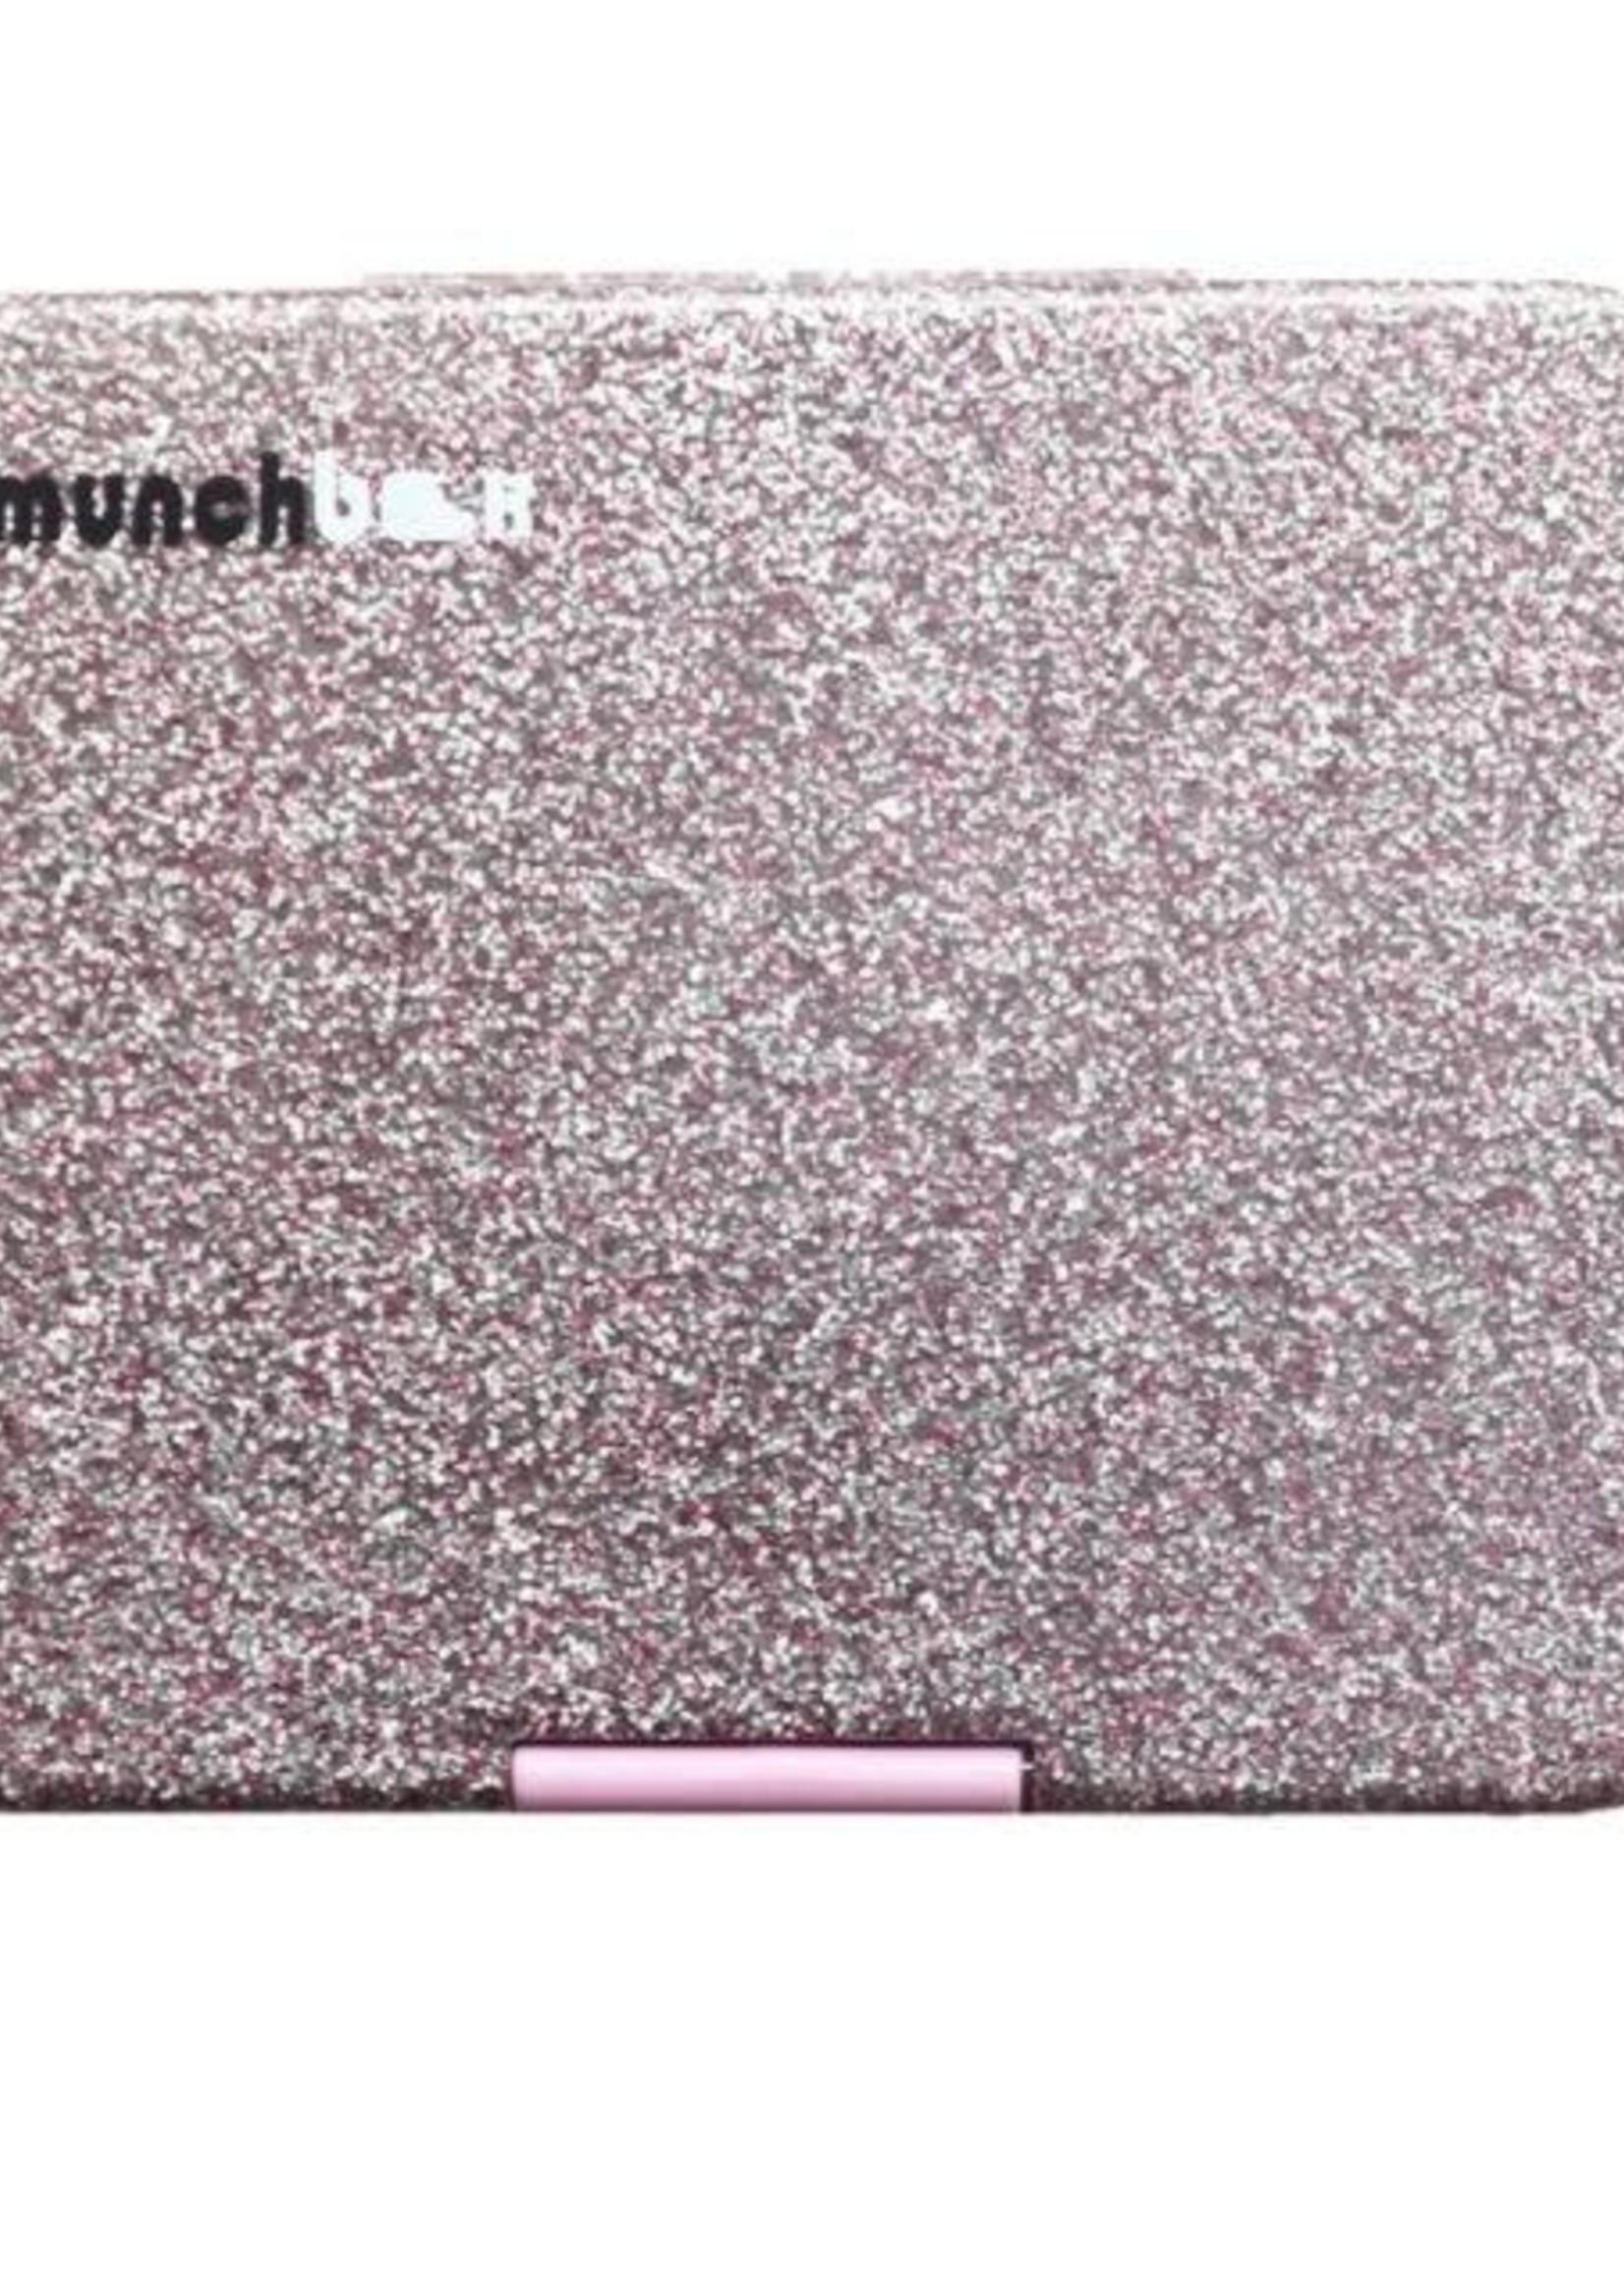 Munchbox Munchbox Maxi 6 (Sparkle Pink)